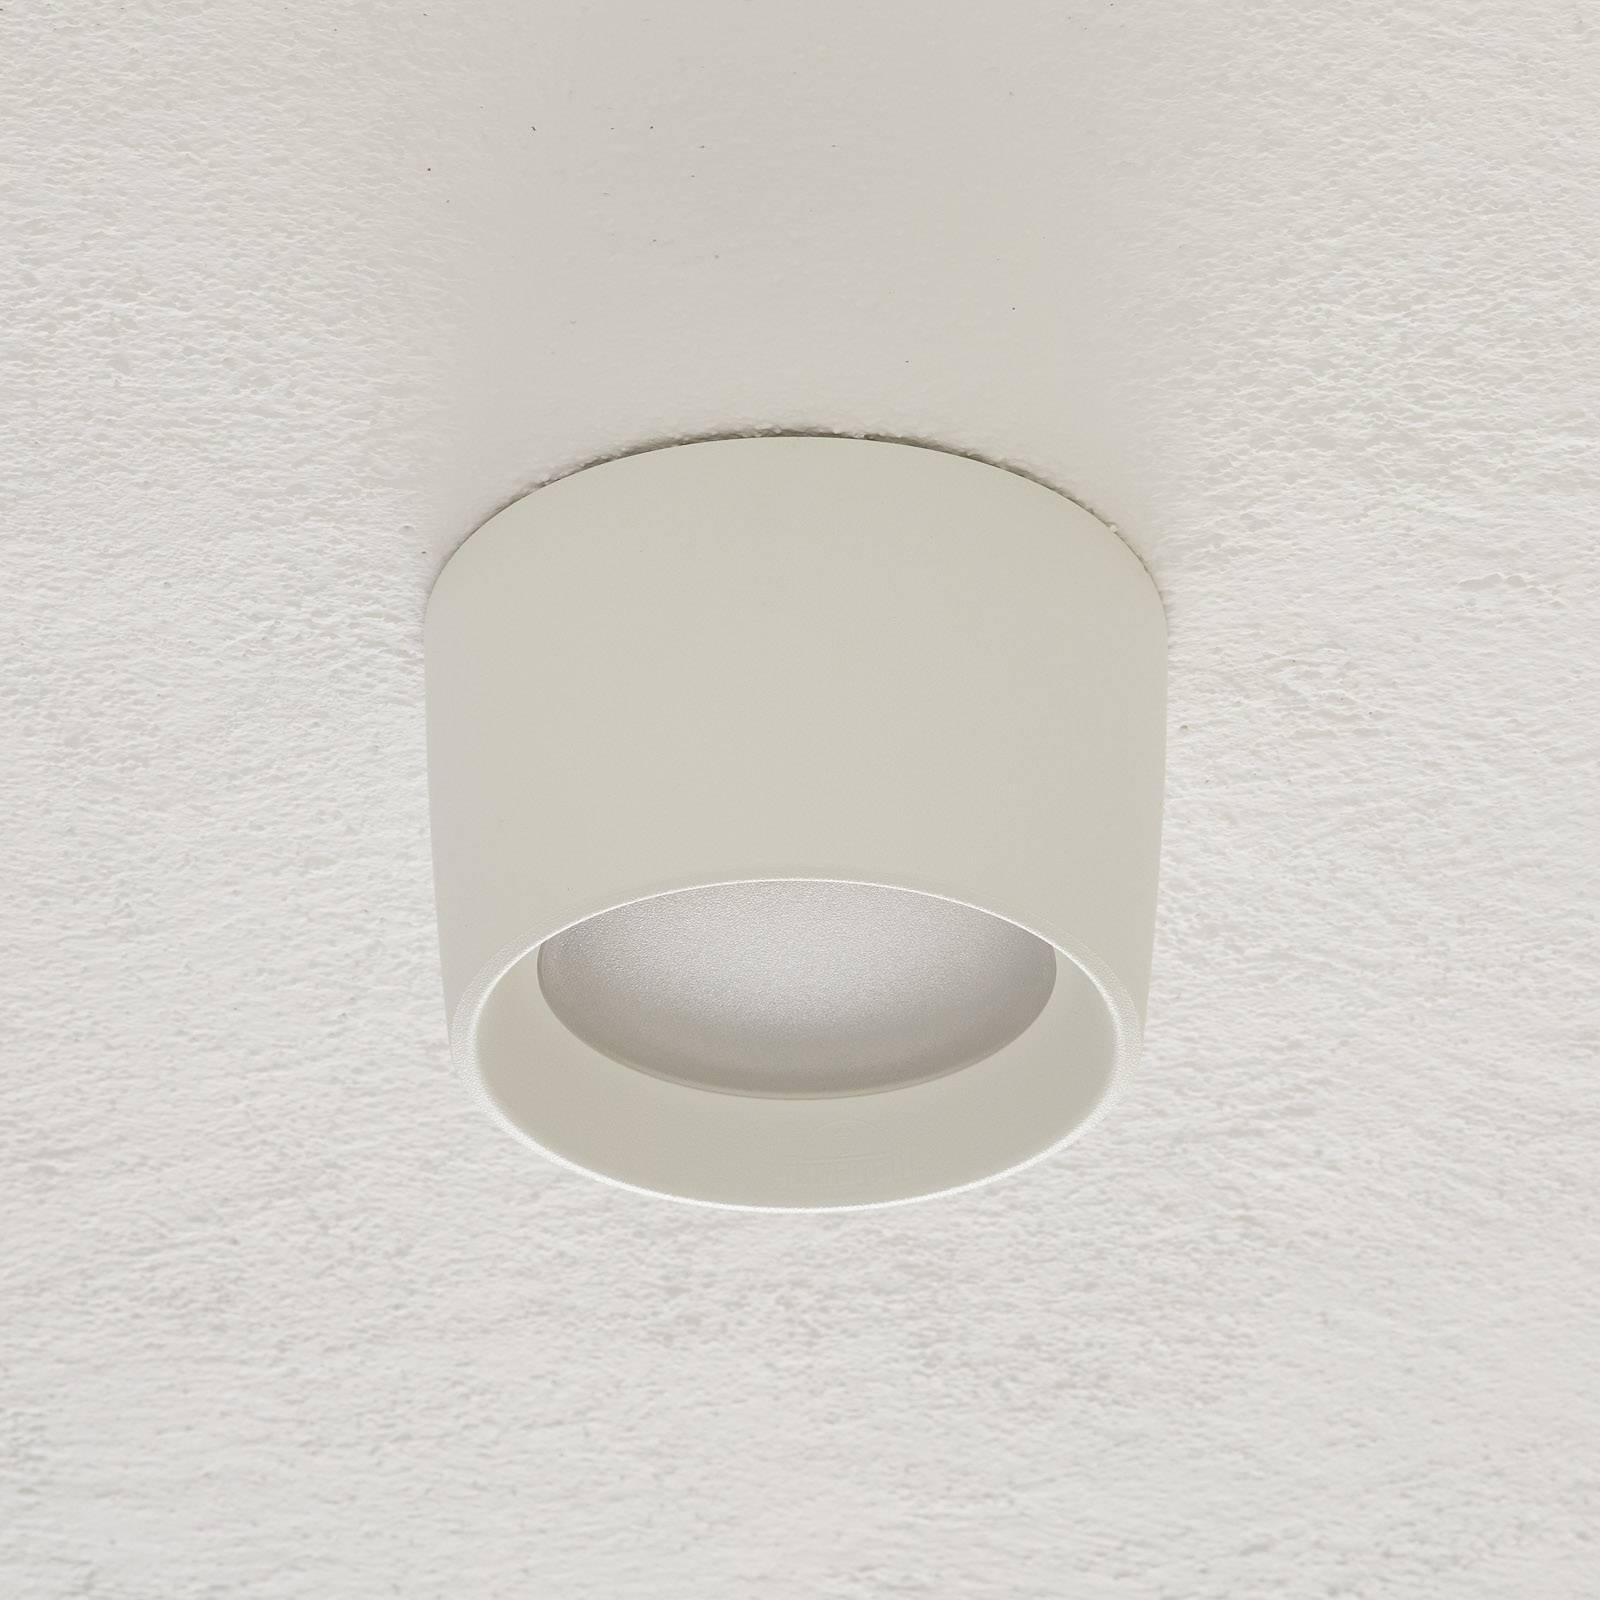 Livia-alasvalo Ø 16 cm CCT valkoinen/frosted